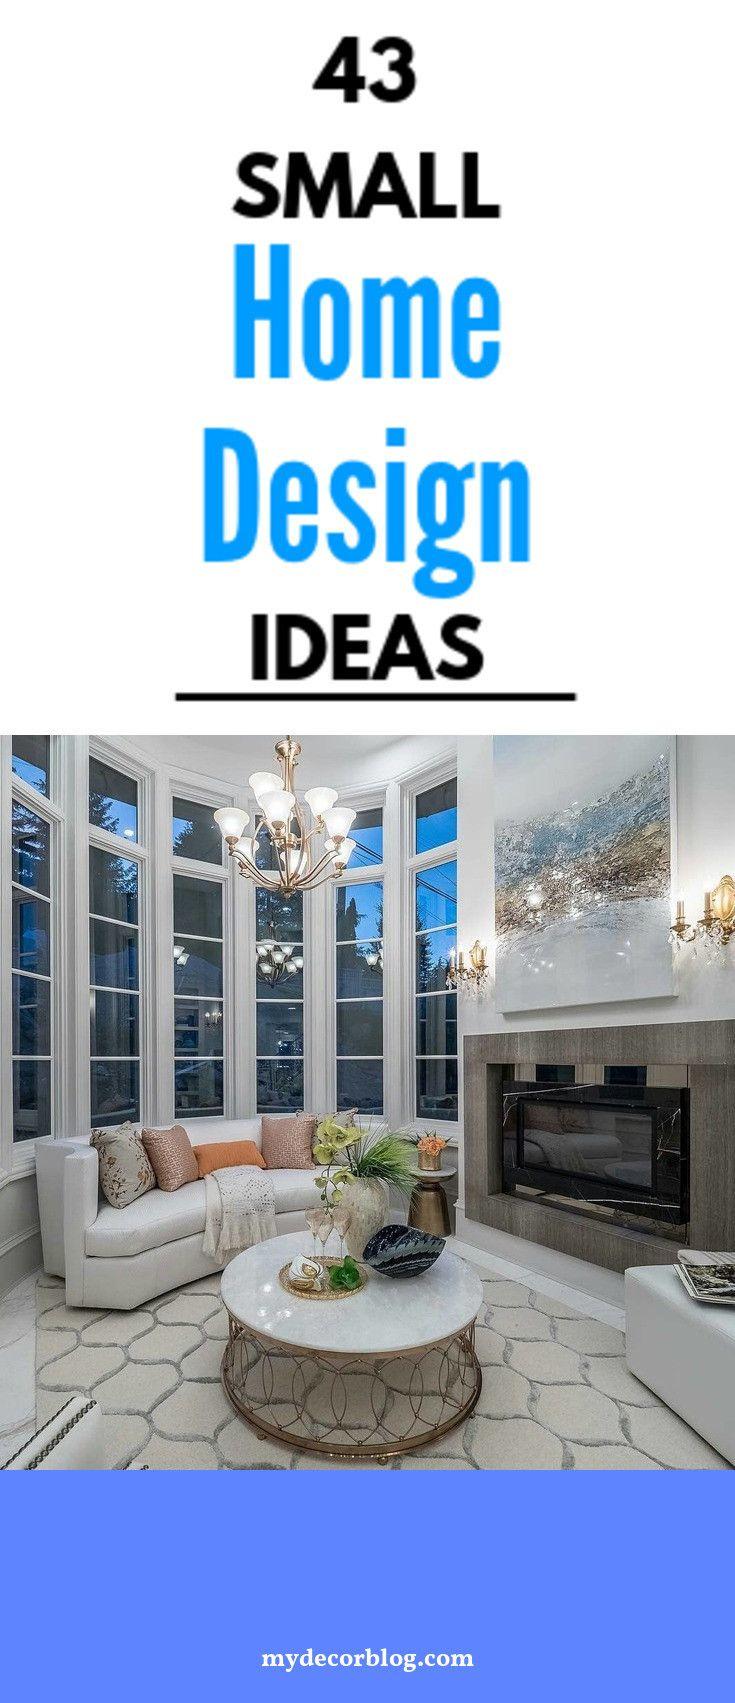 Home Decoration Decoration Ideas Official Youtube Channel S Pinterest Acount Slide Home Decoration Video Home Decoration Home Decor Small House Design Decor